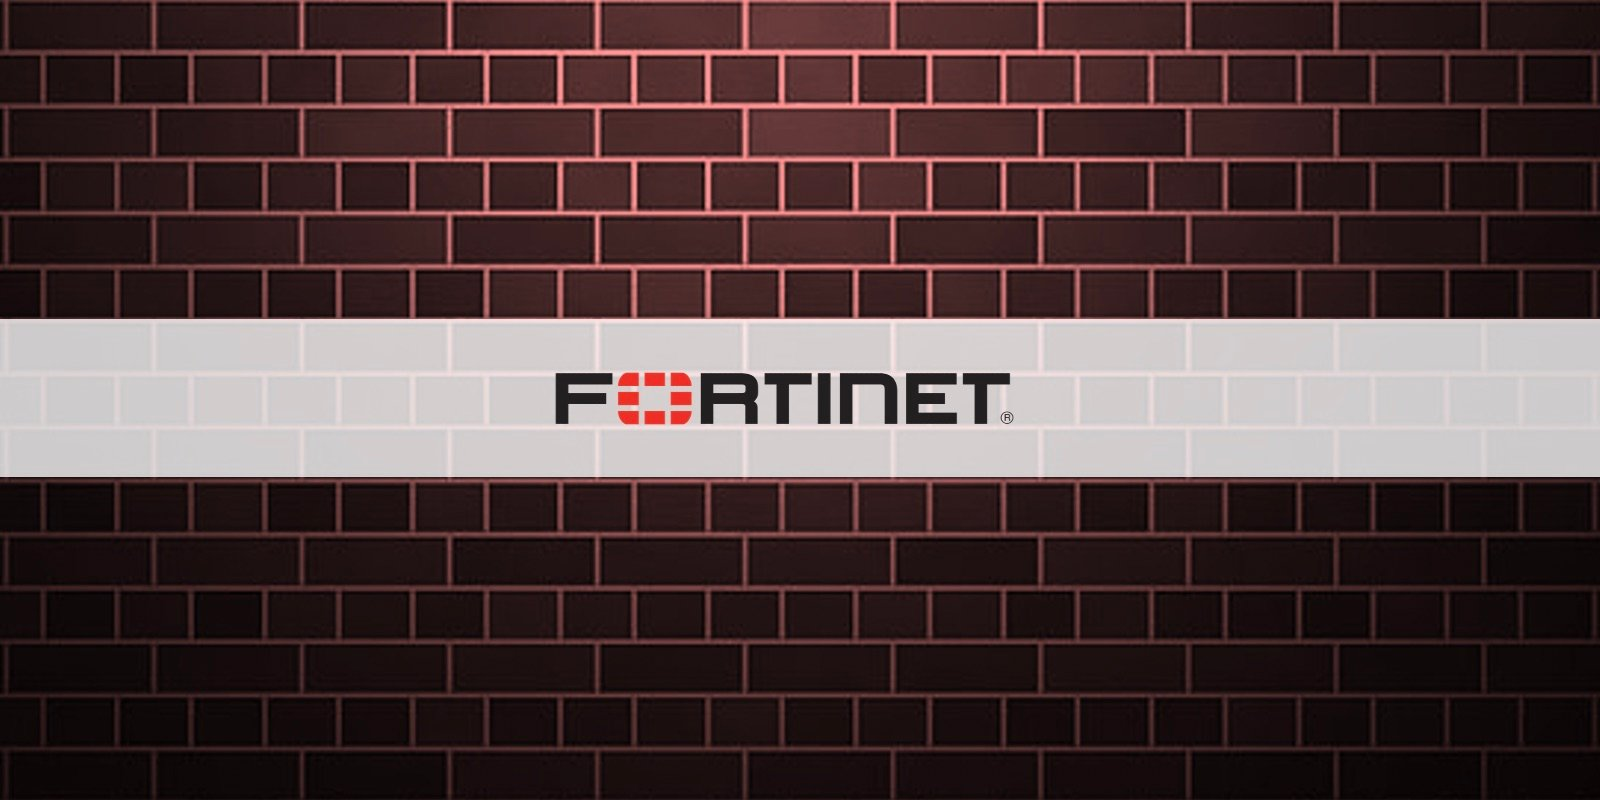 fortinet-red-bg-1.jpg